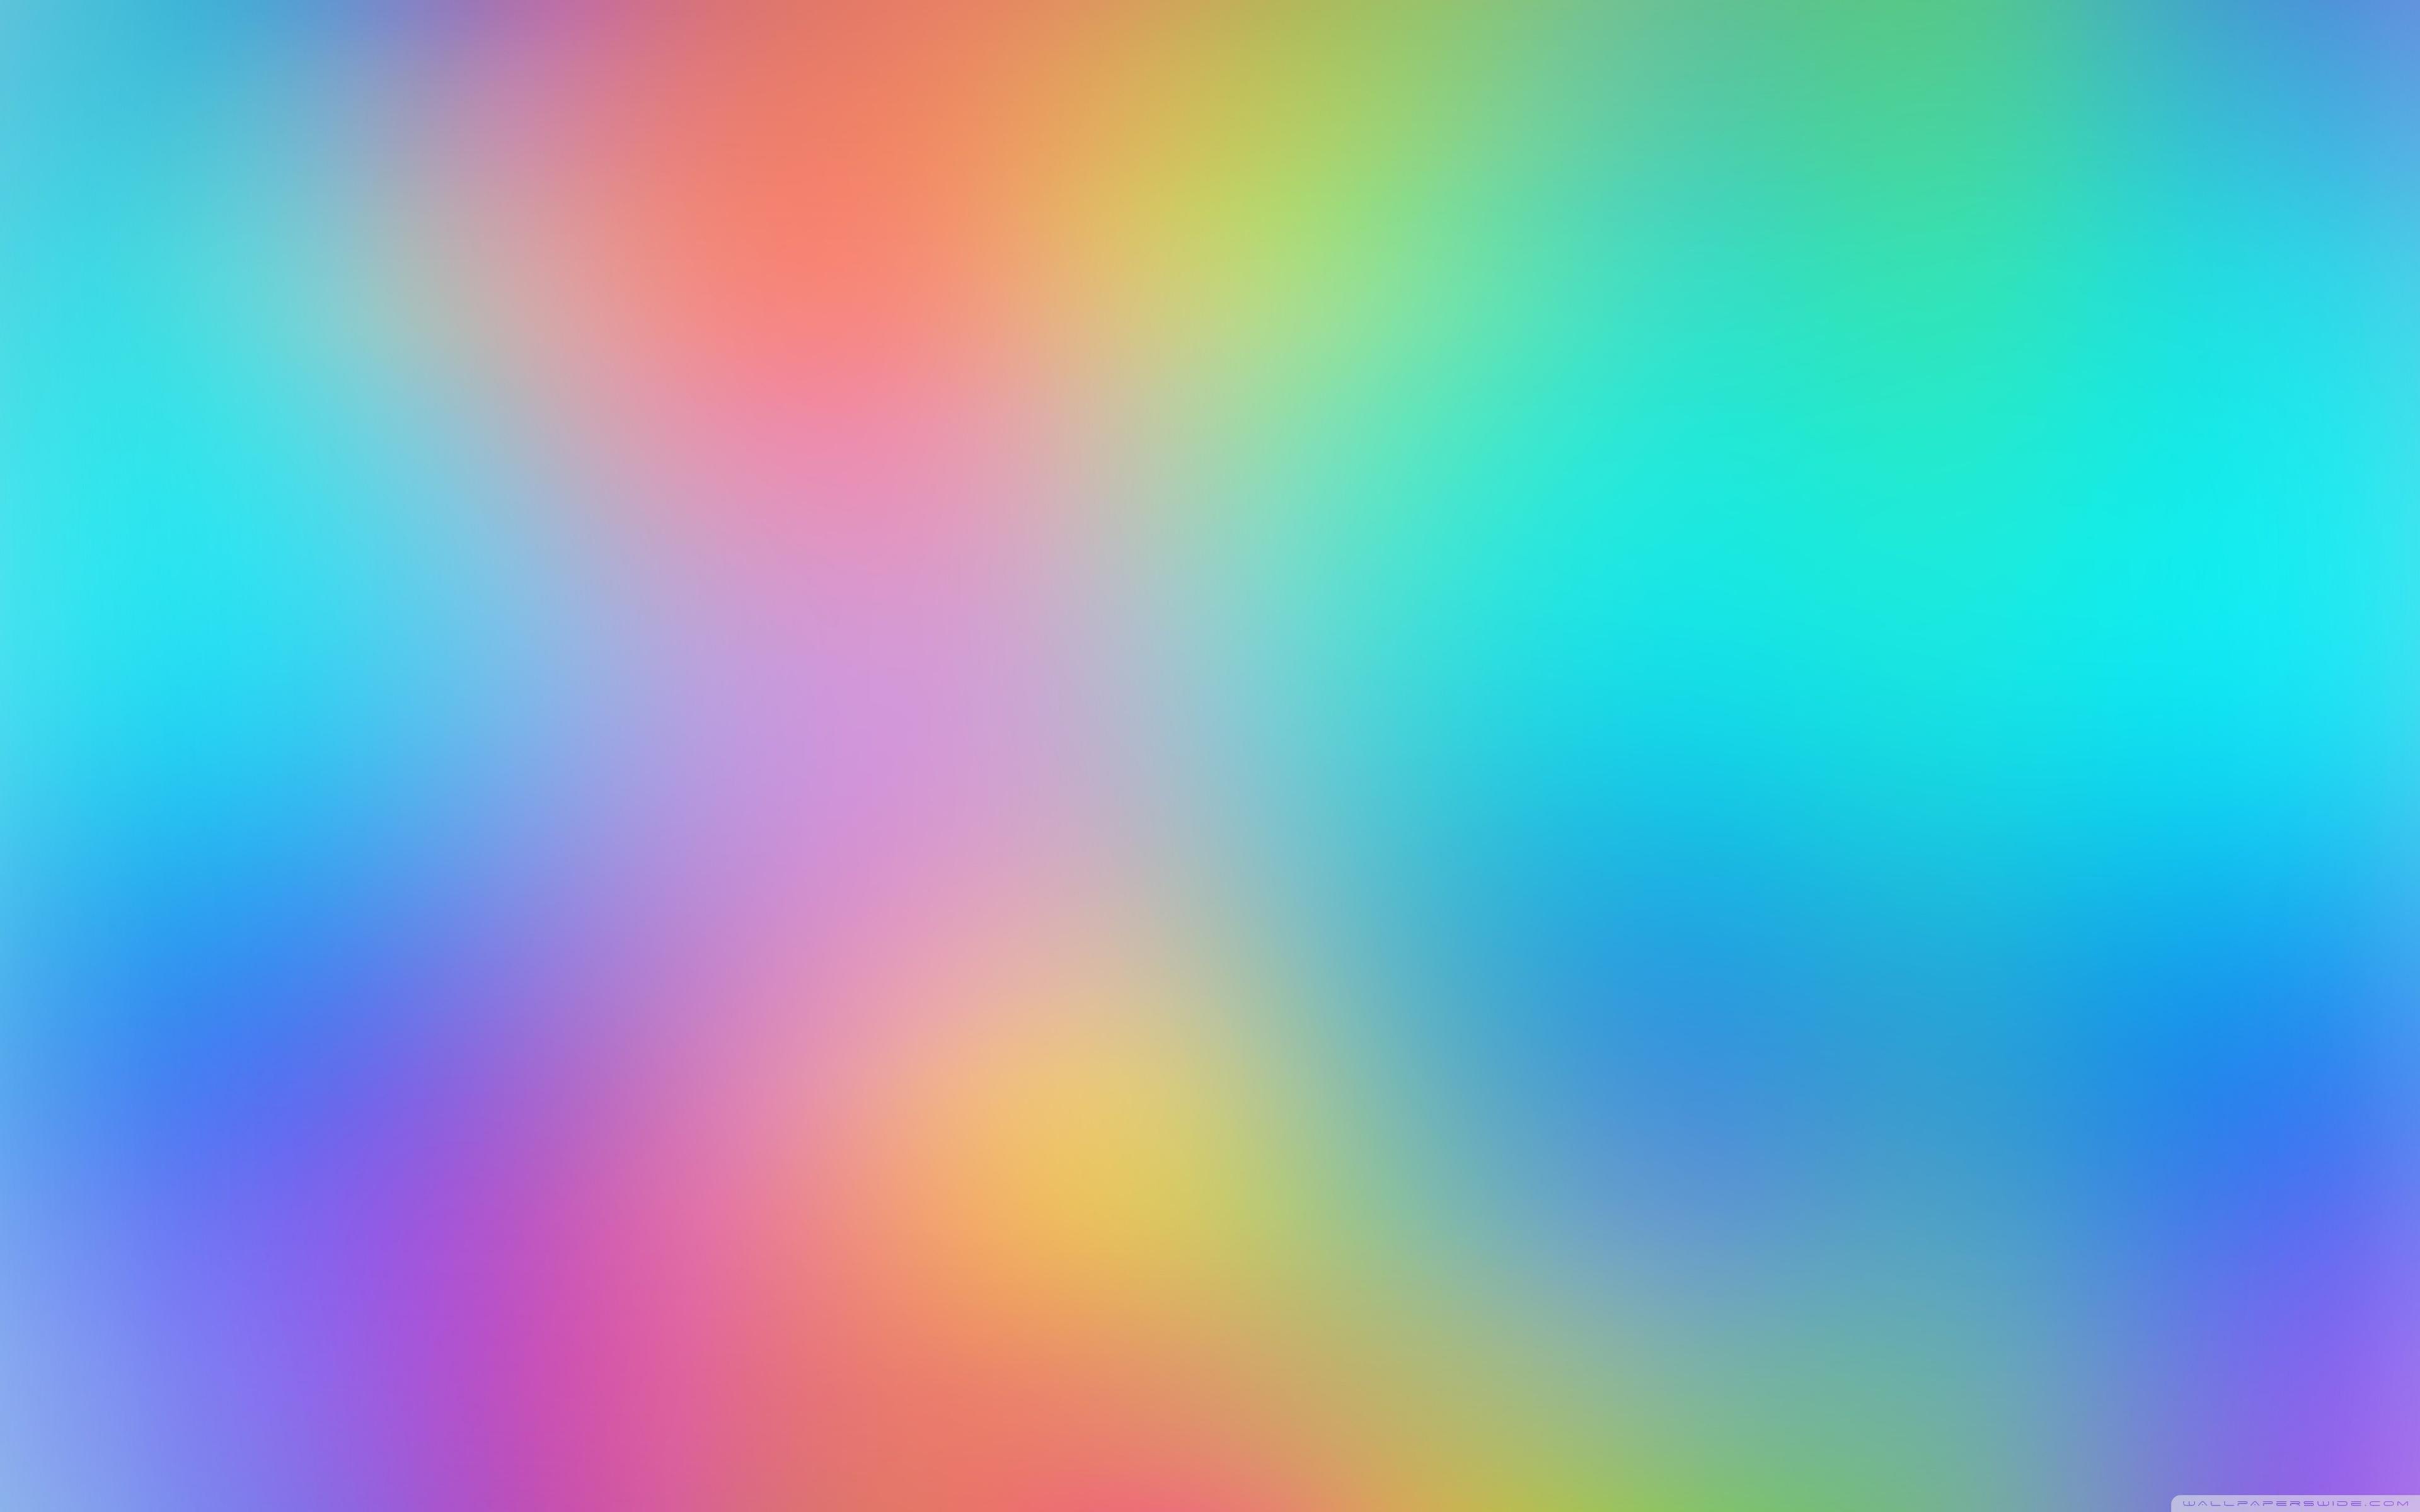 Colorful Desktop Backgrounds - HD Wallpaper